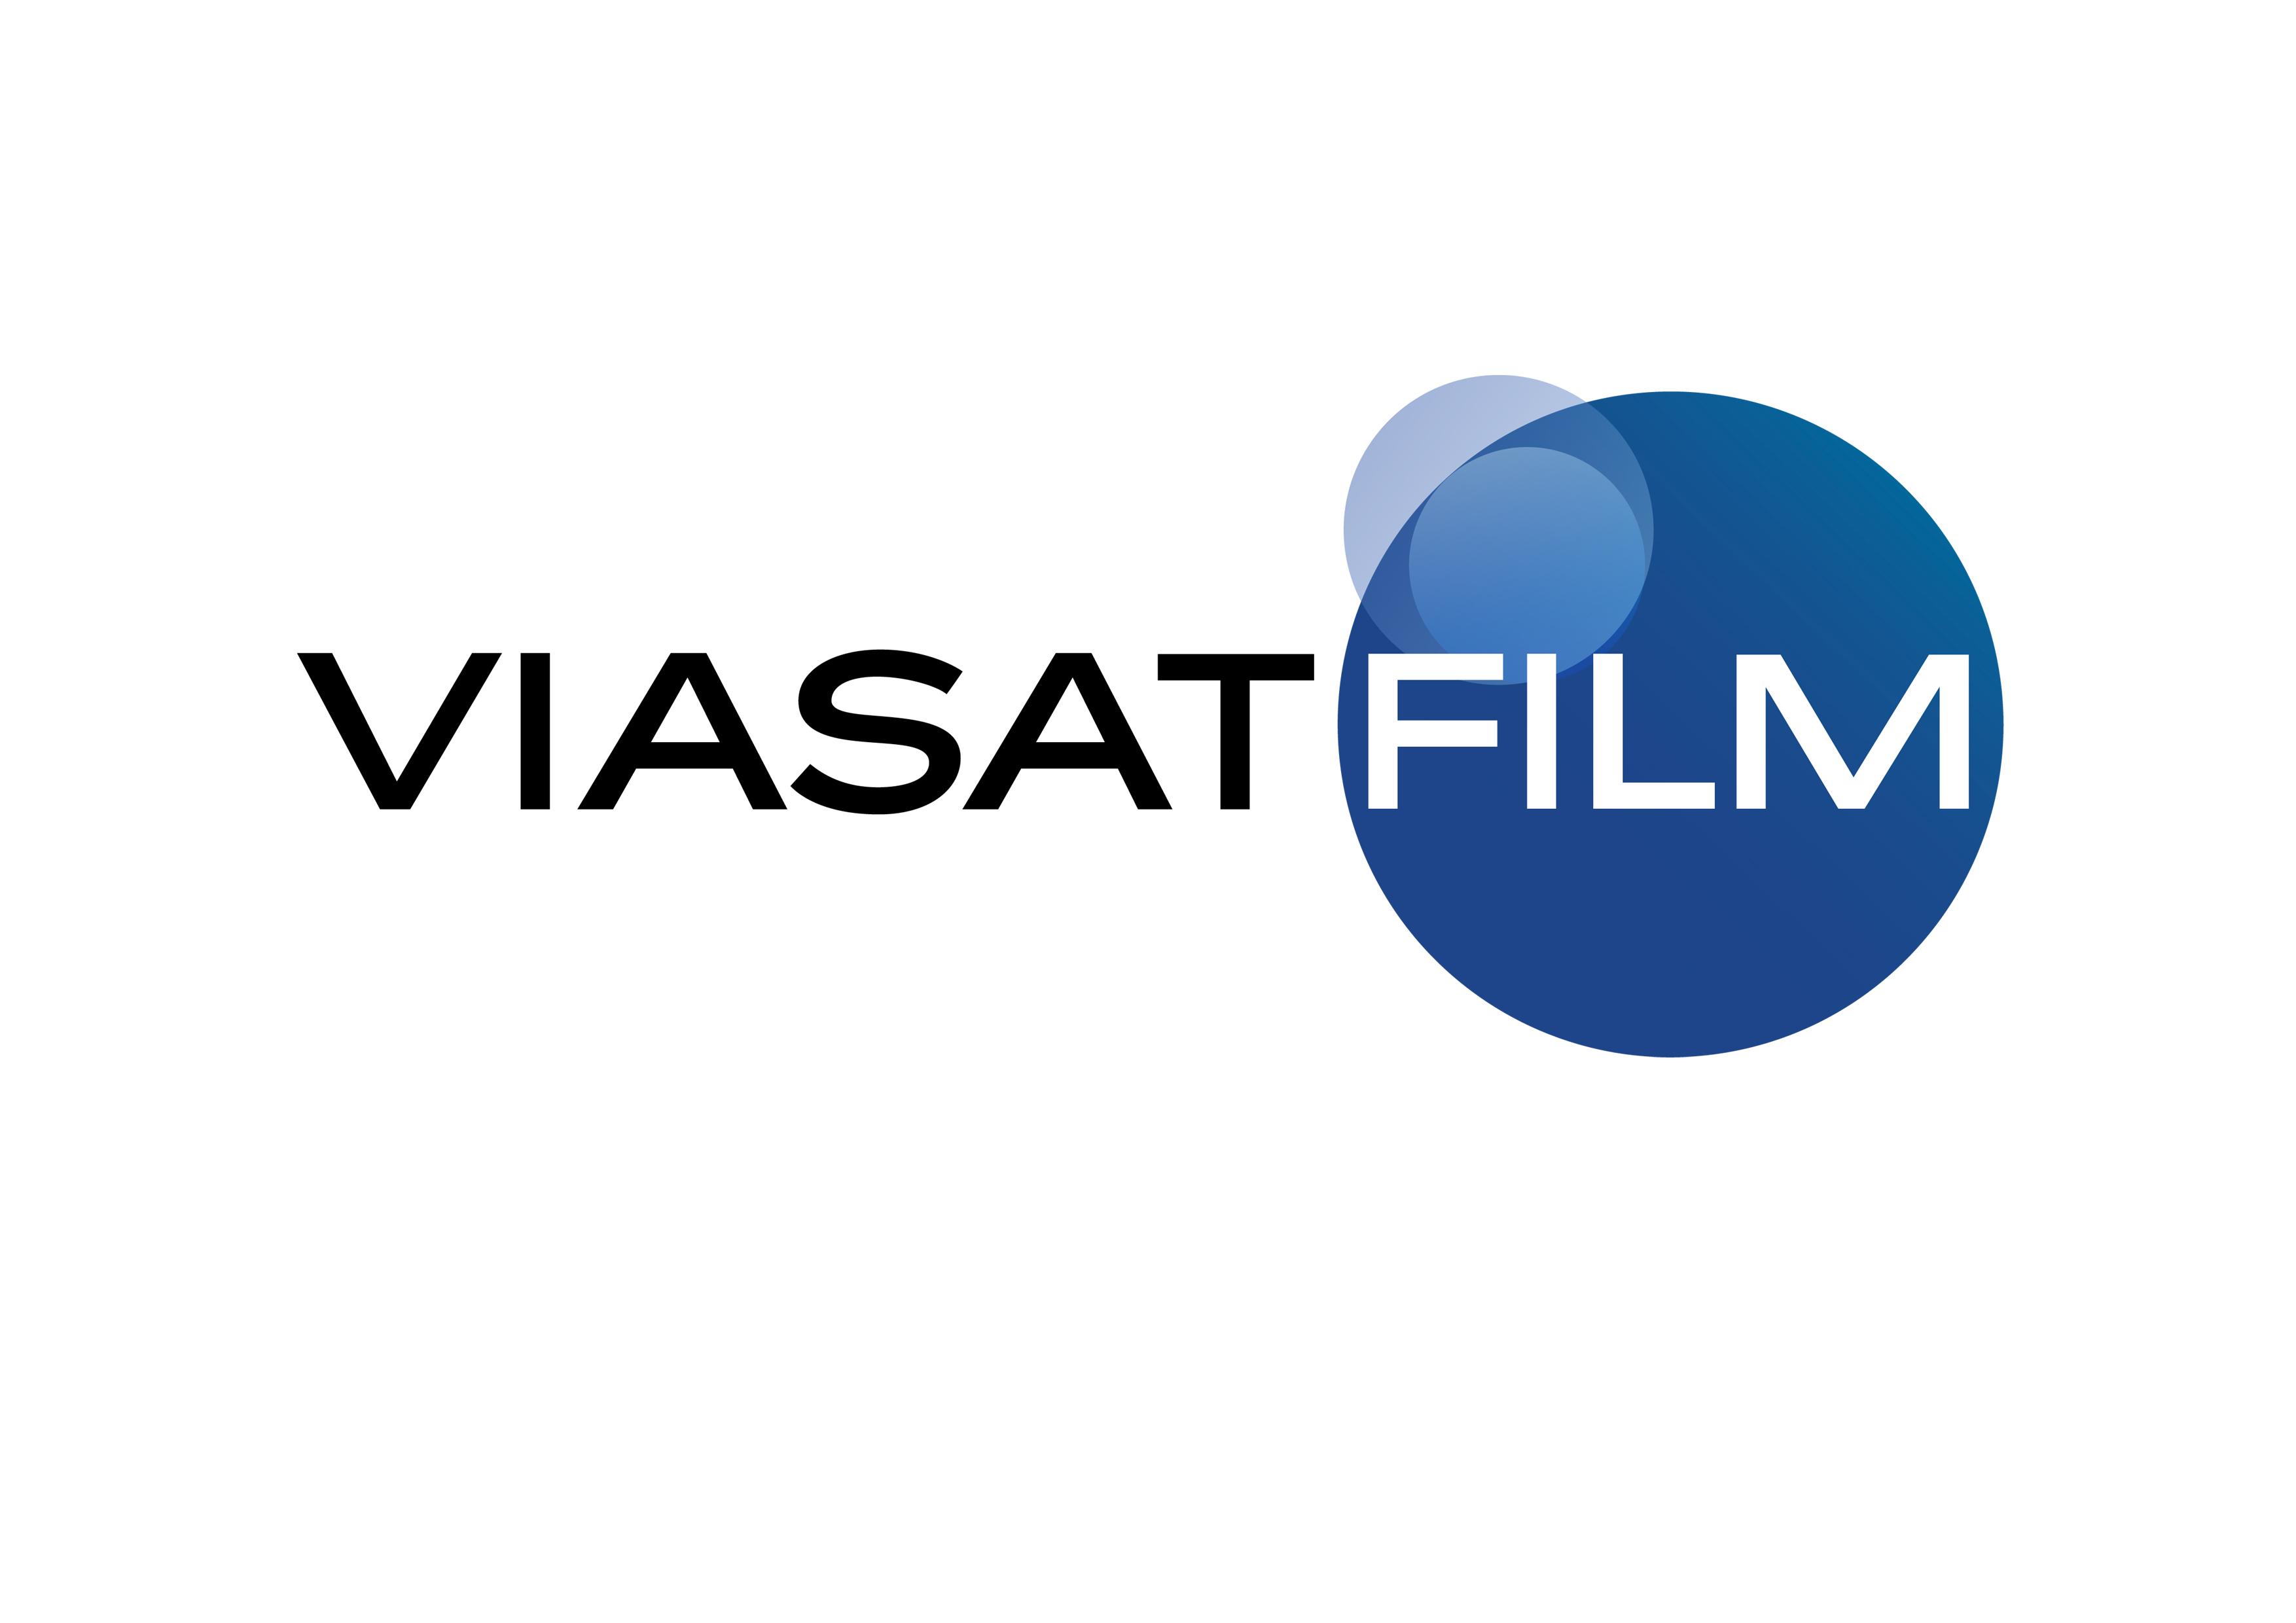 viasat silver film